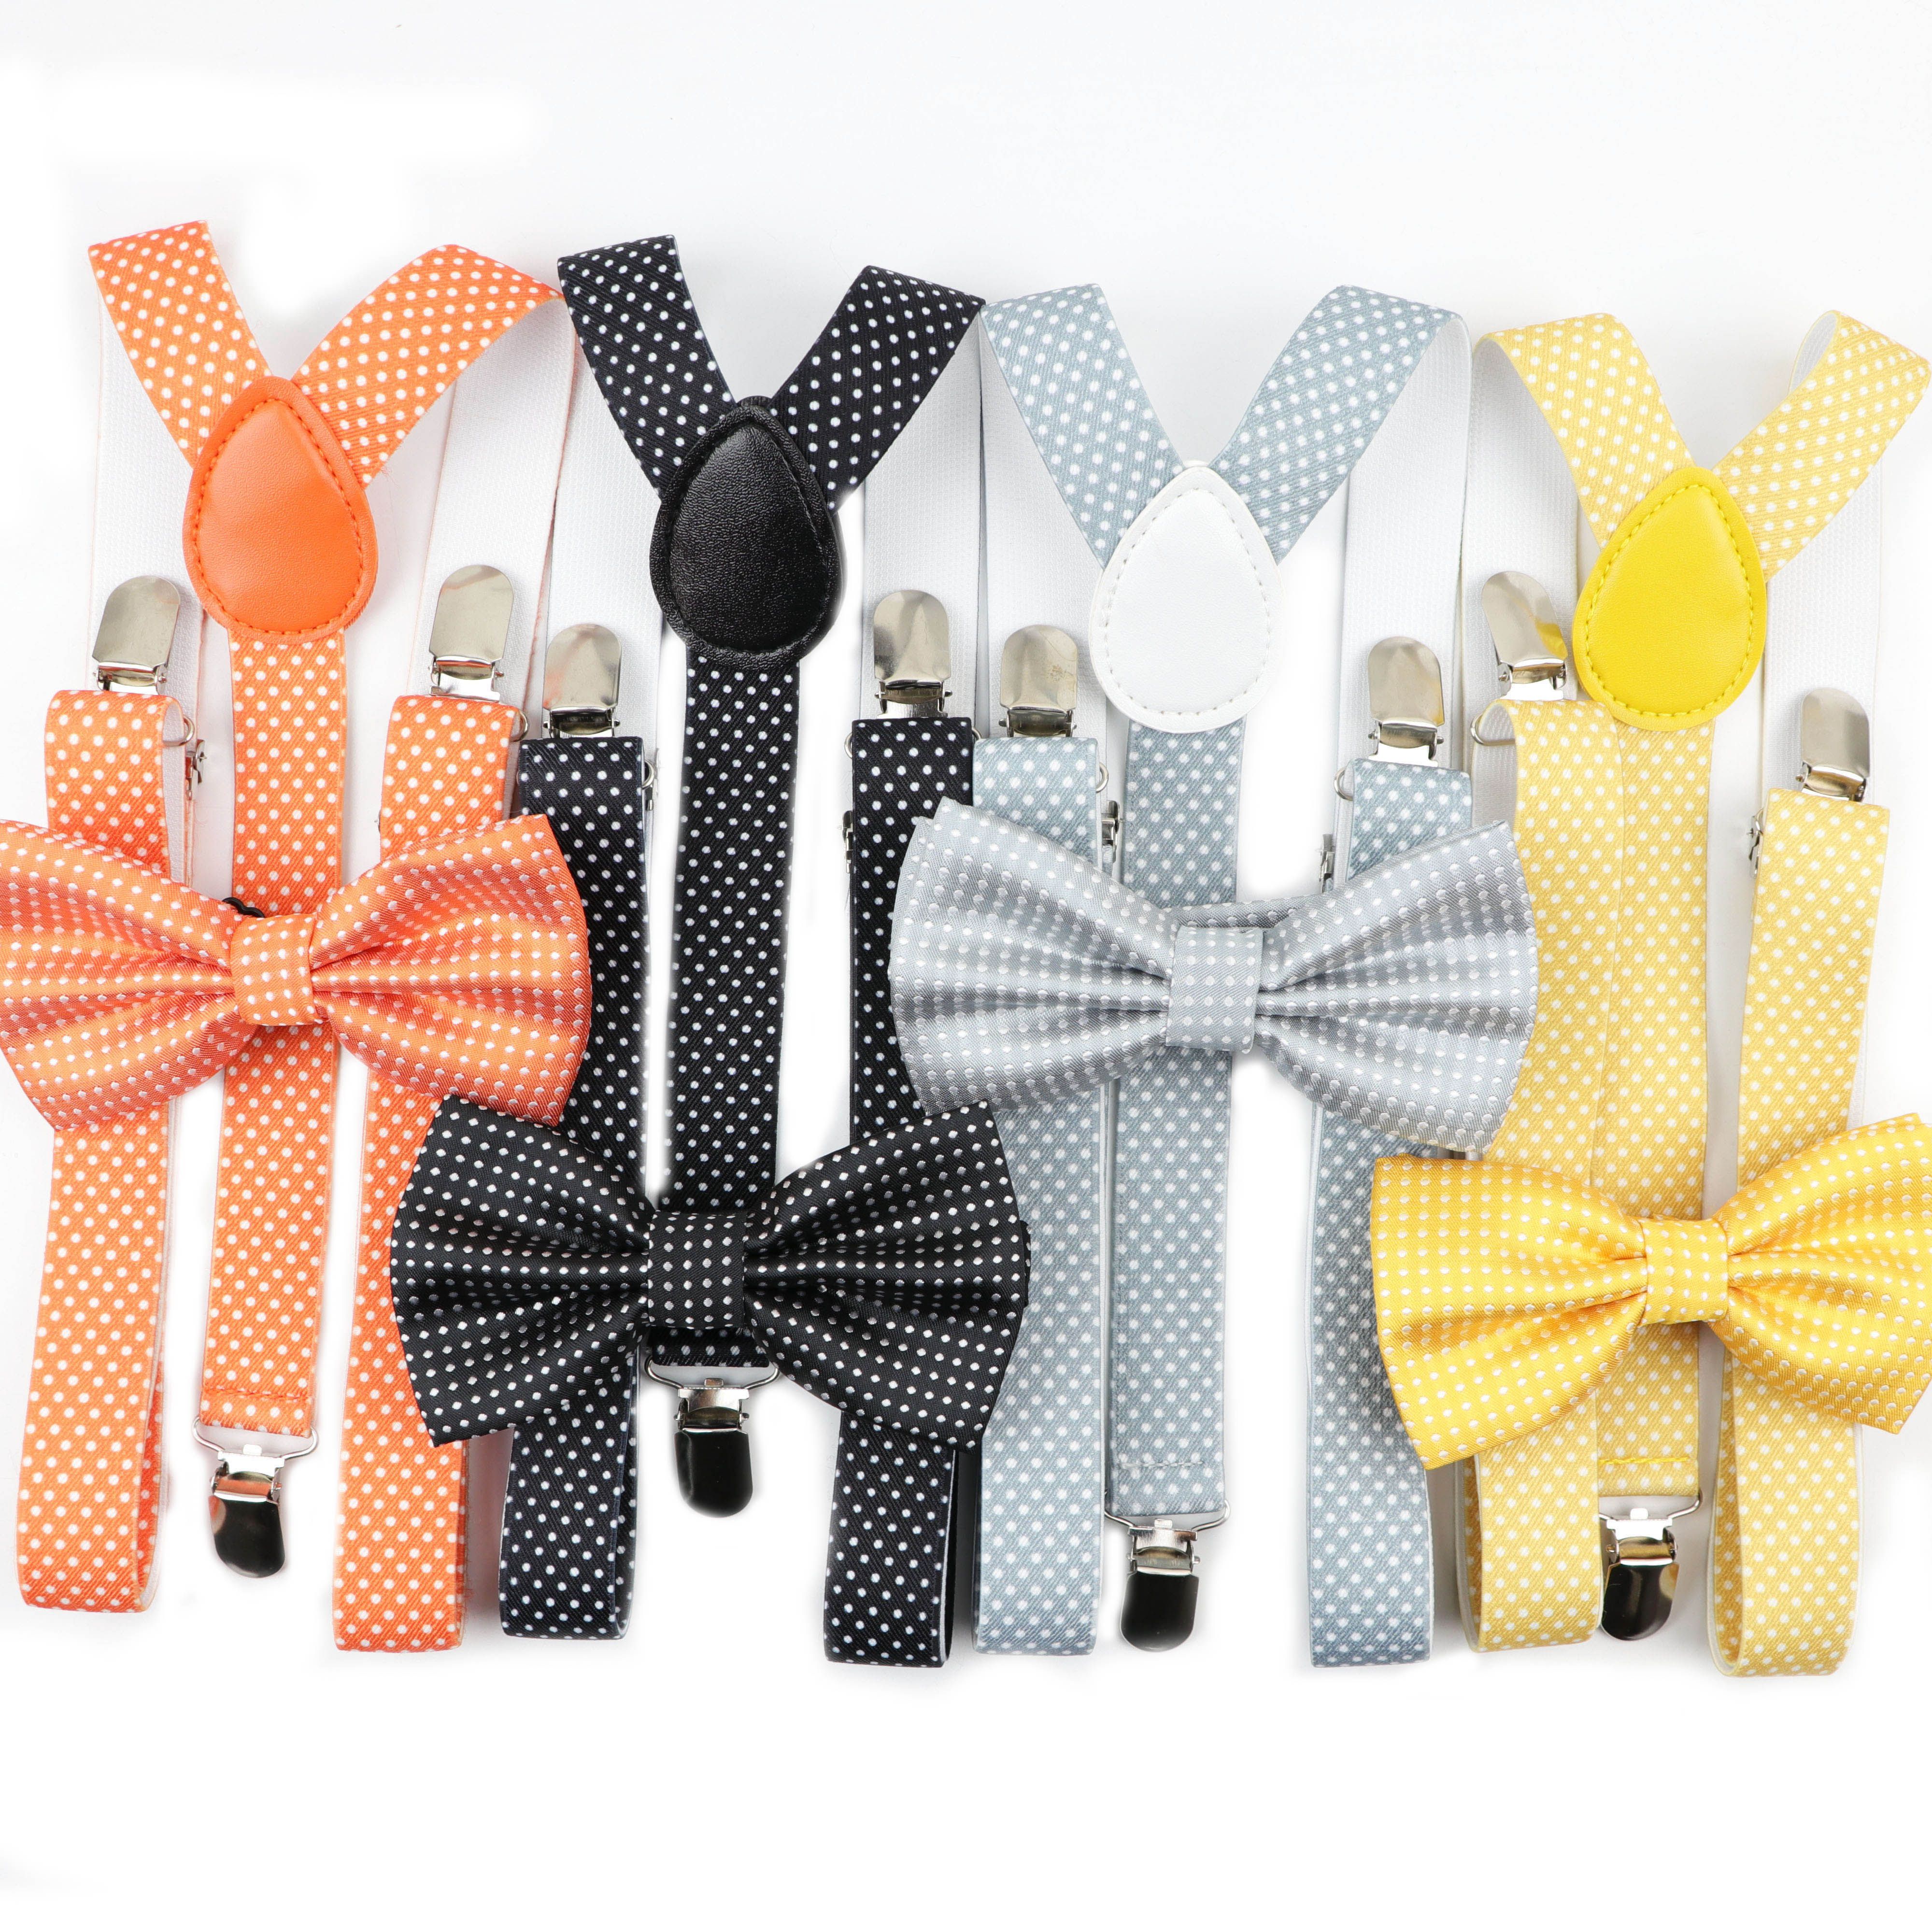 Man Belt Knitted Bow Tie Set Woman Men's Suspenders Butterfly Clip-on Y-Back Braces Suit Elastic Women Adjustable Suiting